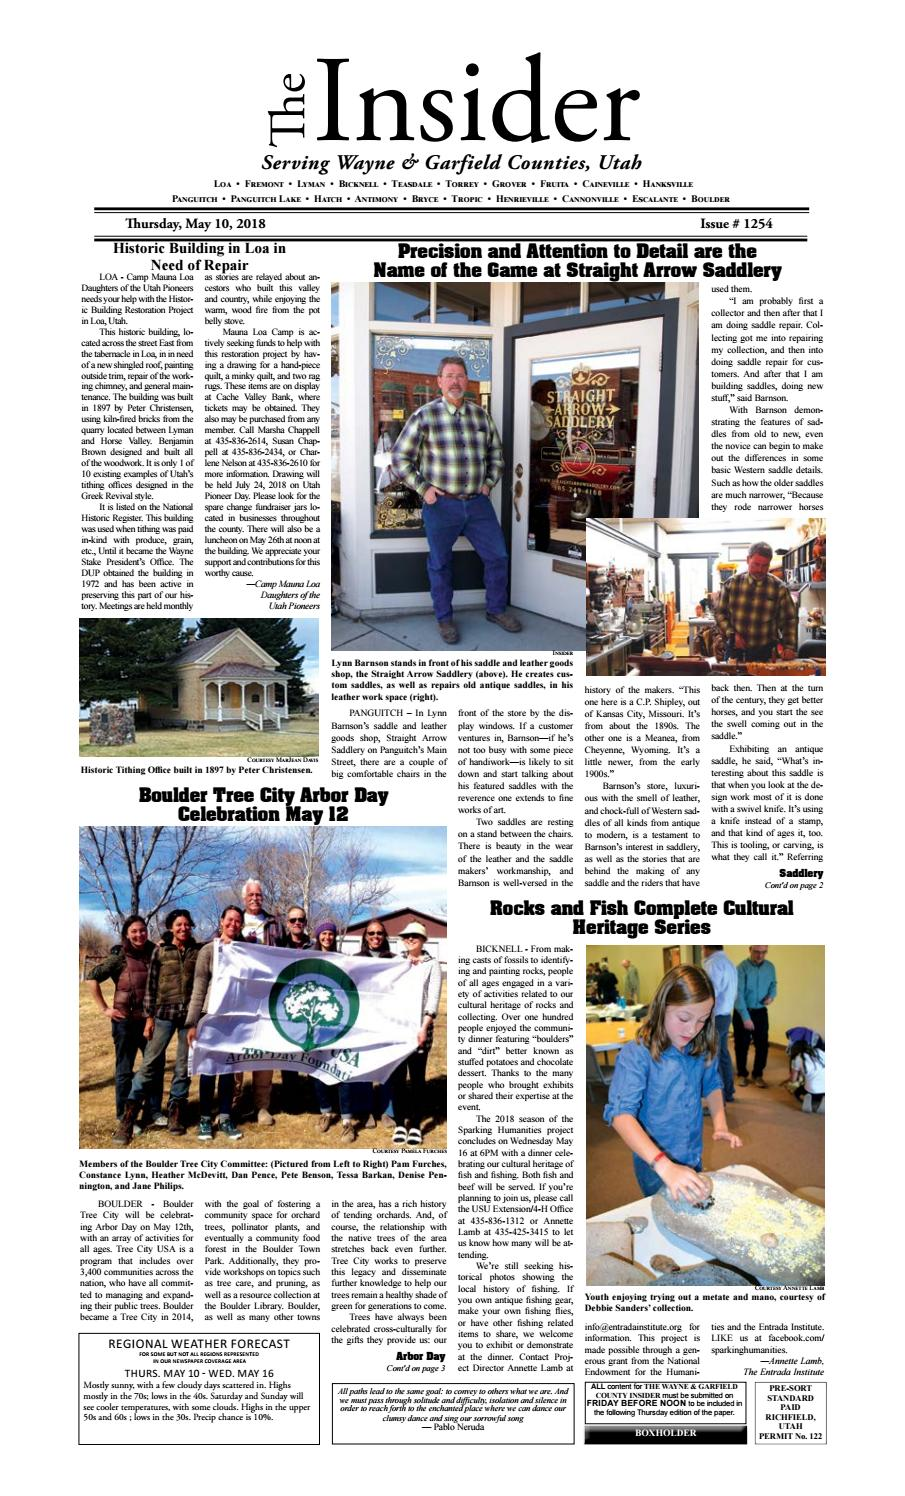 The Wayne & Garfield County Insider May 10, 2018 by Snapshot